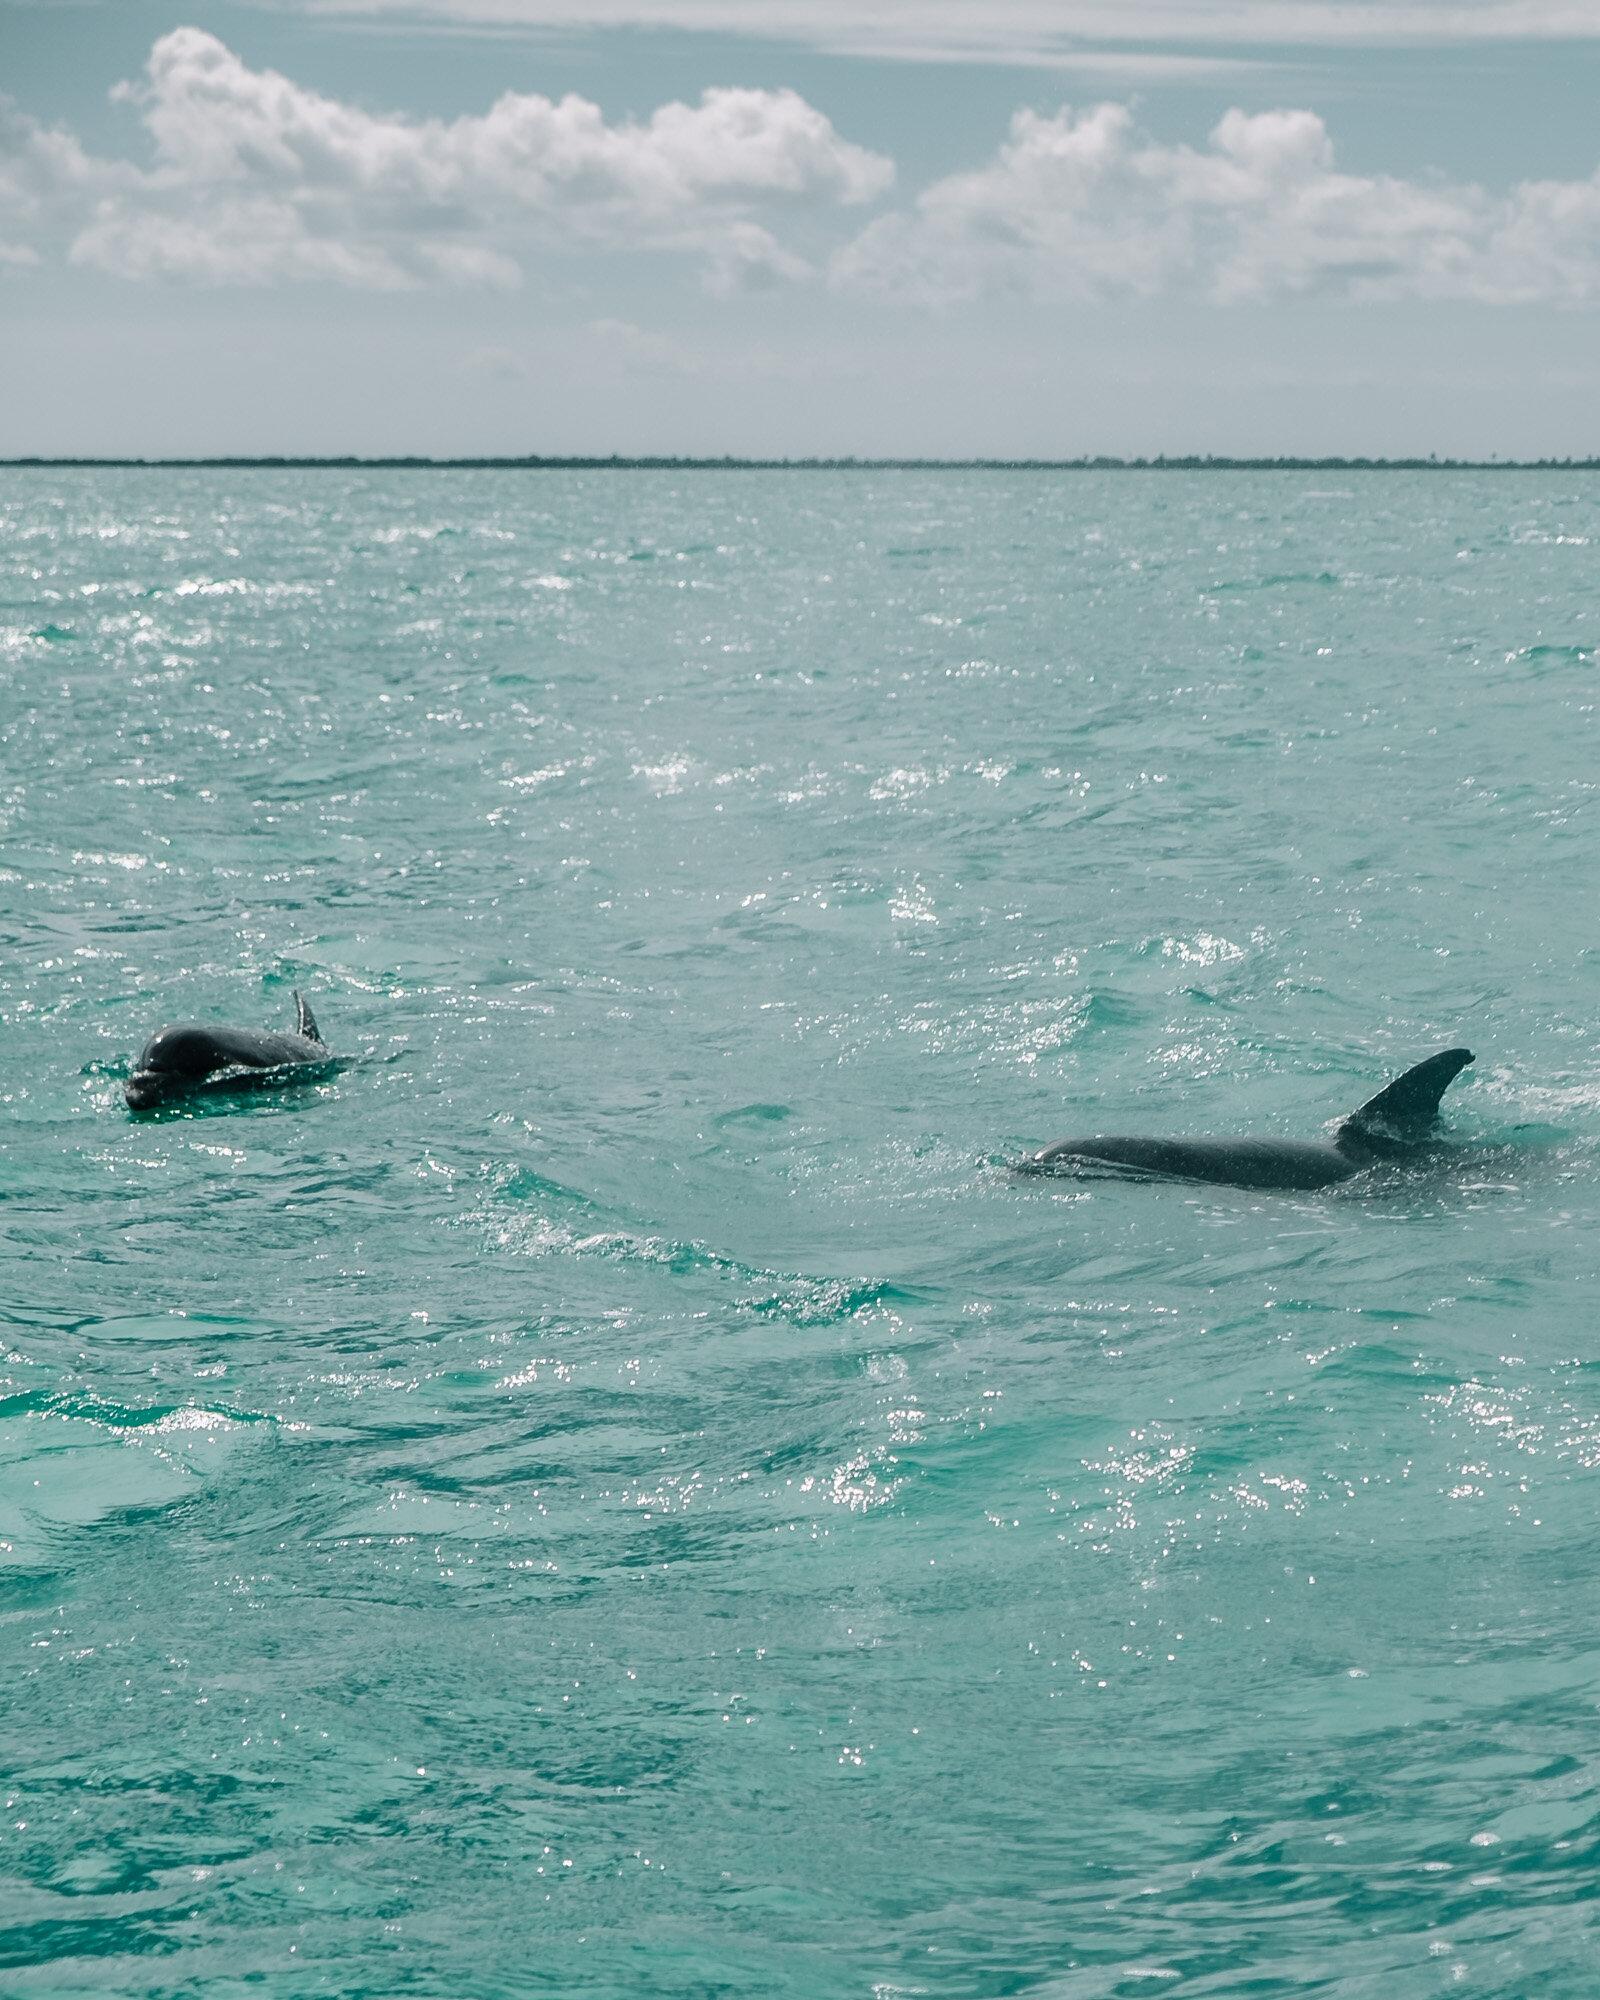 Rachel Off Duty: Dolphins in Sian Kaan, Tulum, Mexico